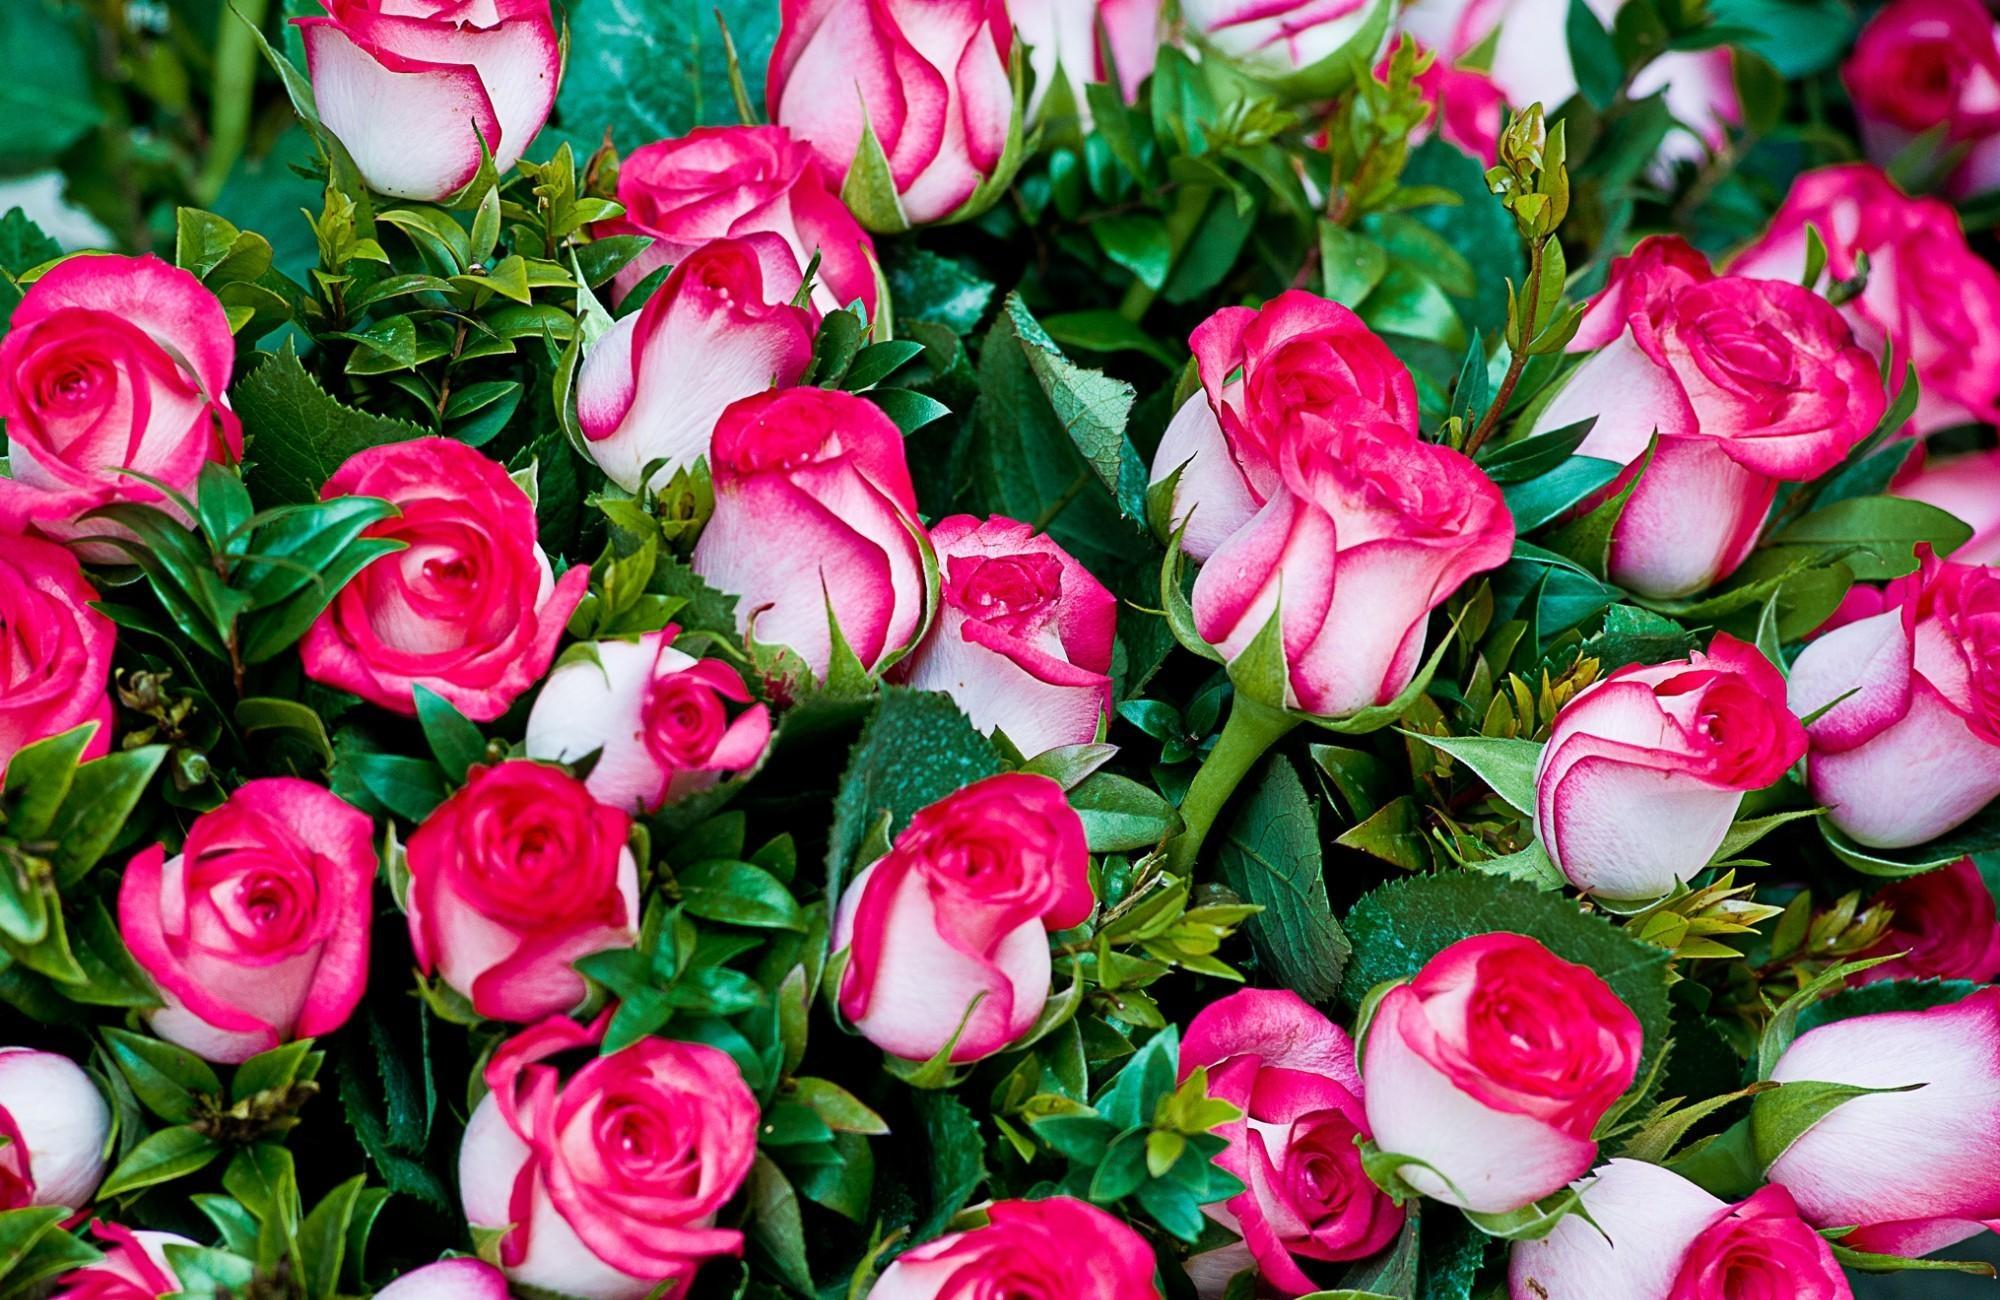 Красивое фото цветов розы